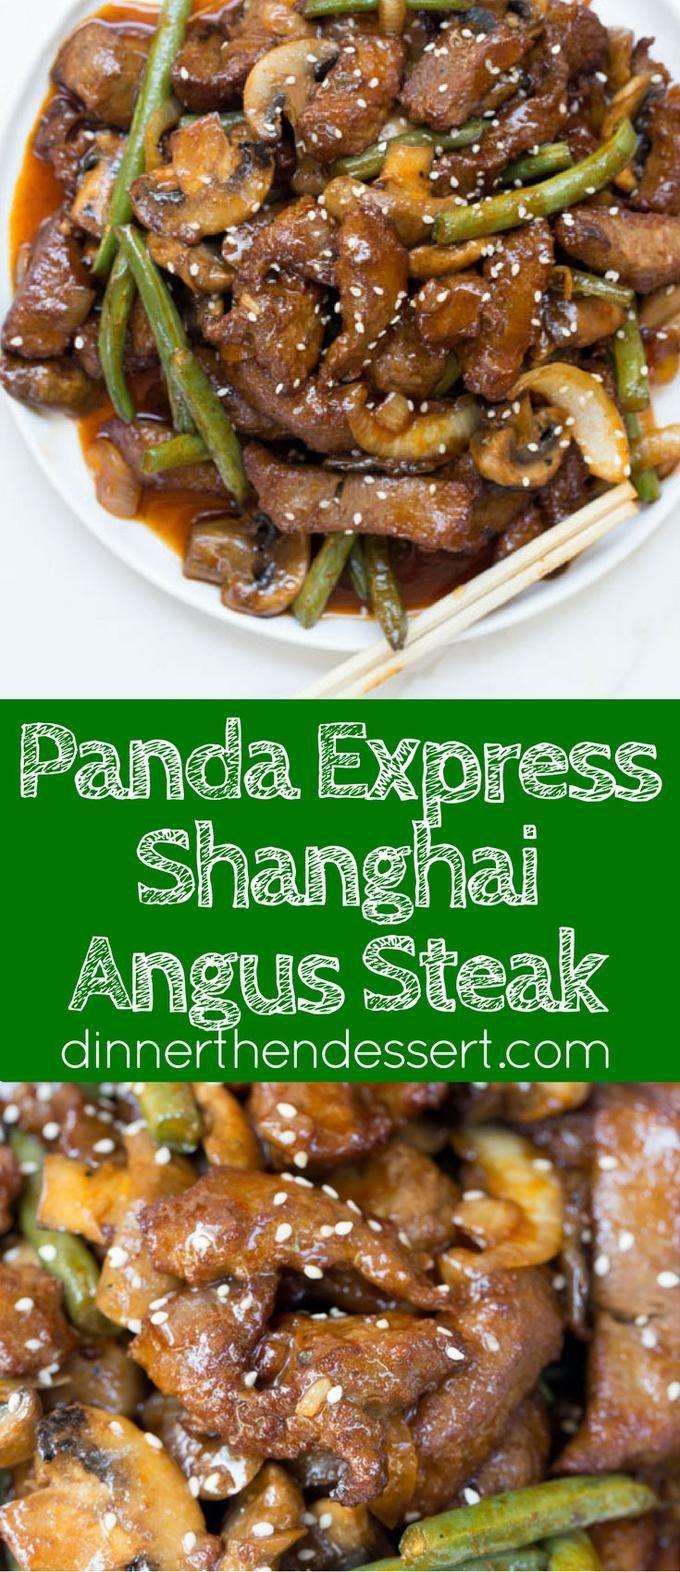 Panda Express Shanghai Angus Steak Is A Quick Stir Fry Dish With